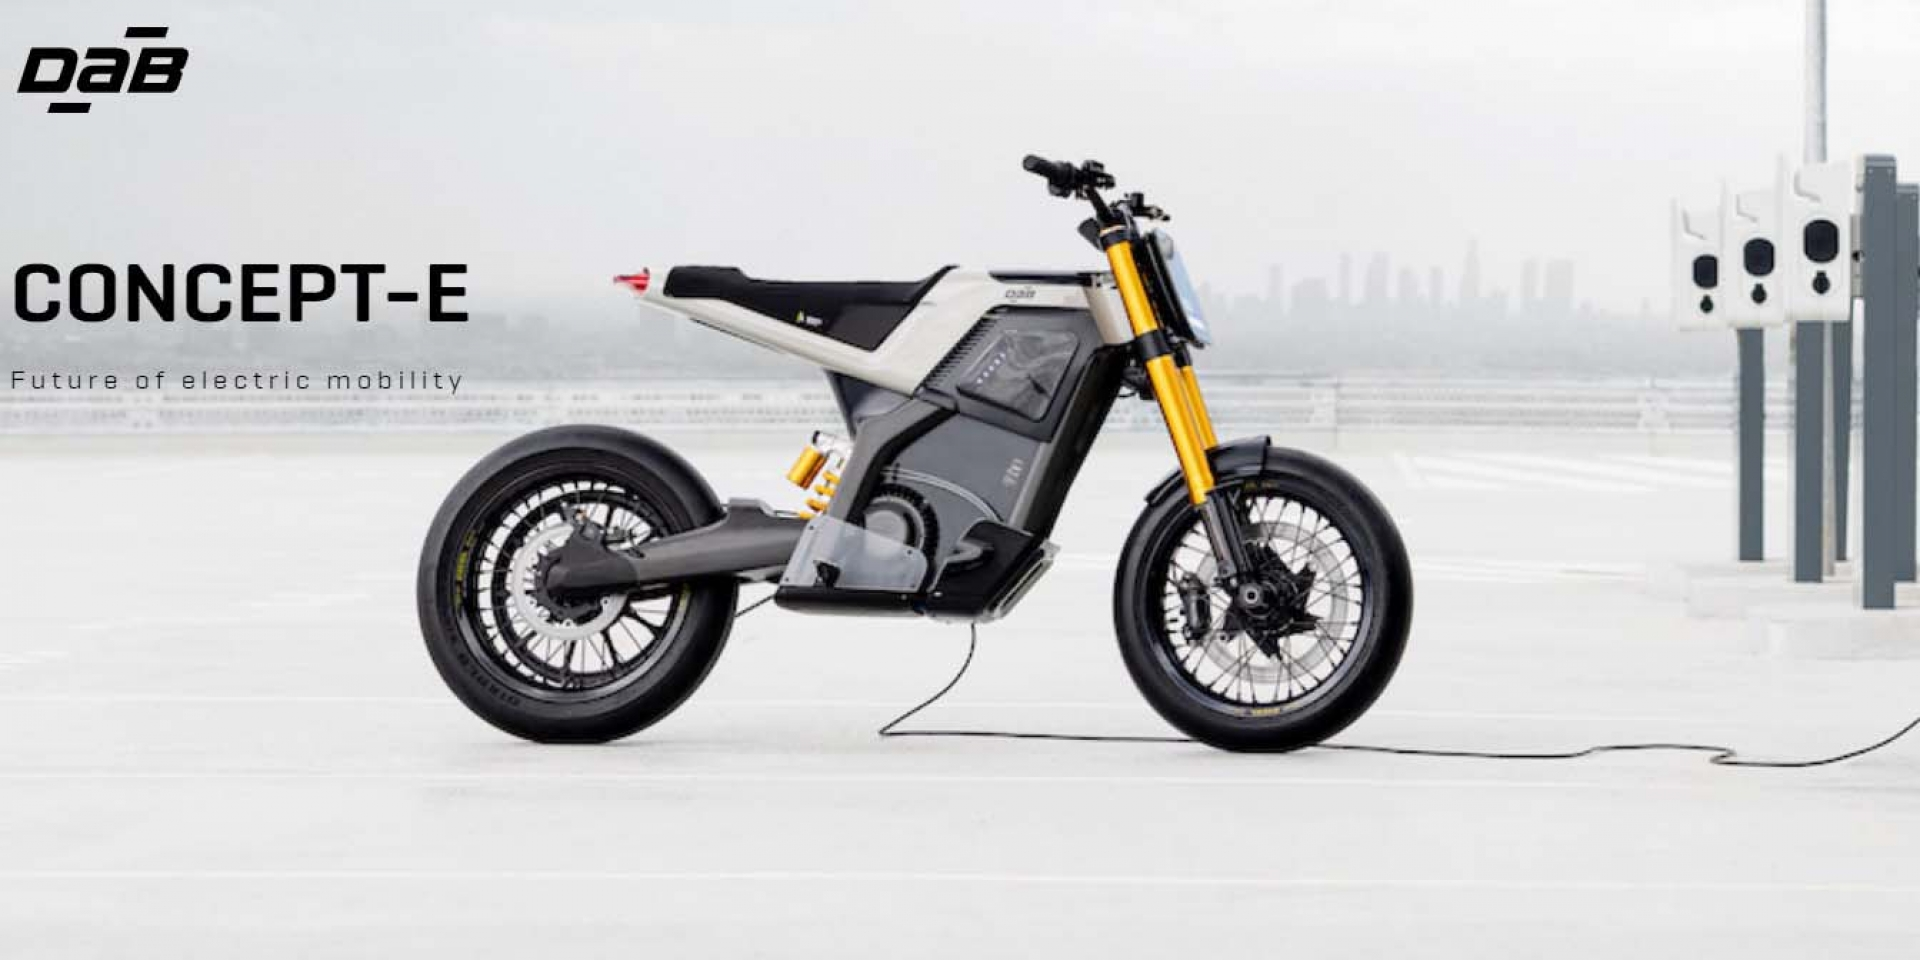 極簡精品電動車 ! 法國DAB Motors 首推Concept-E